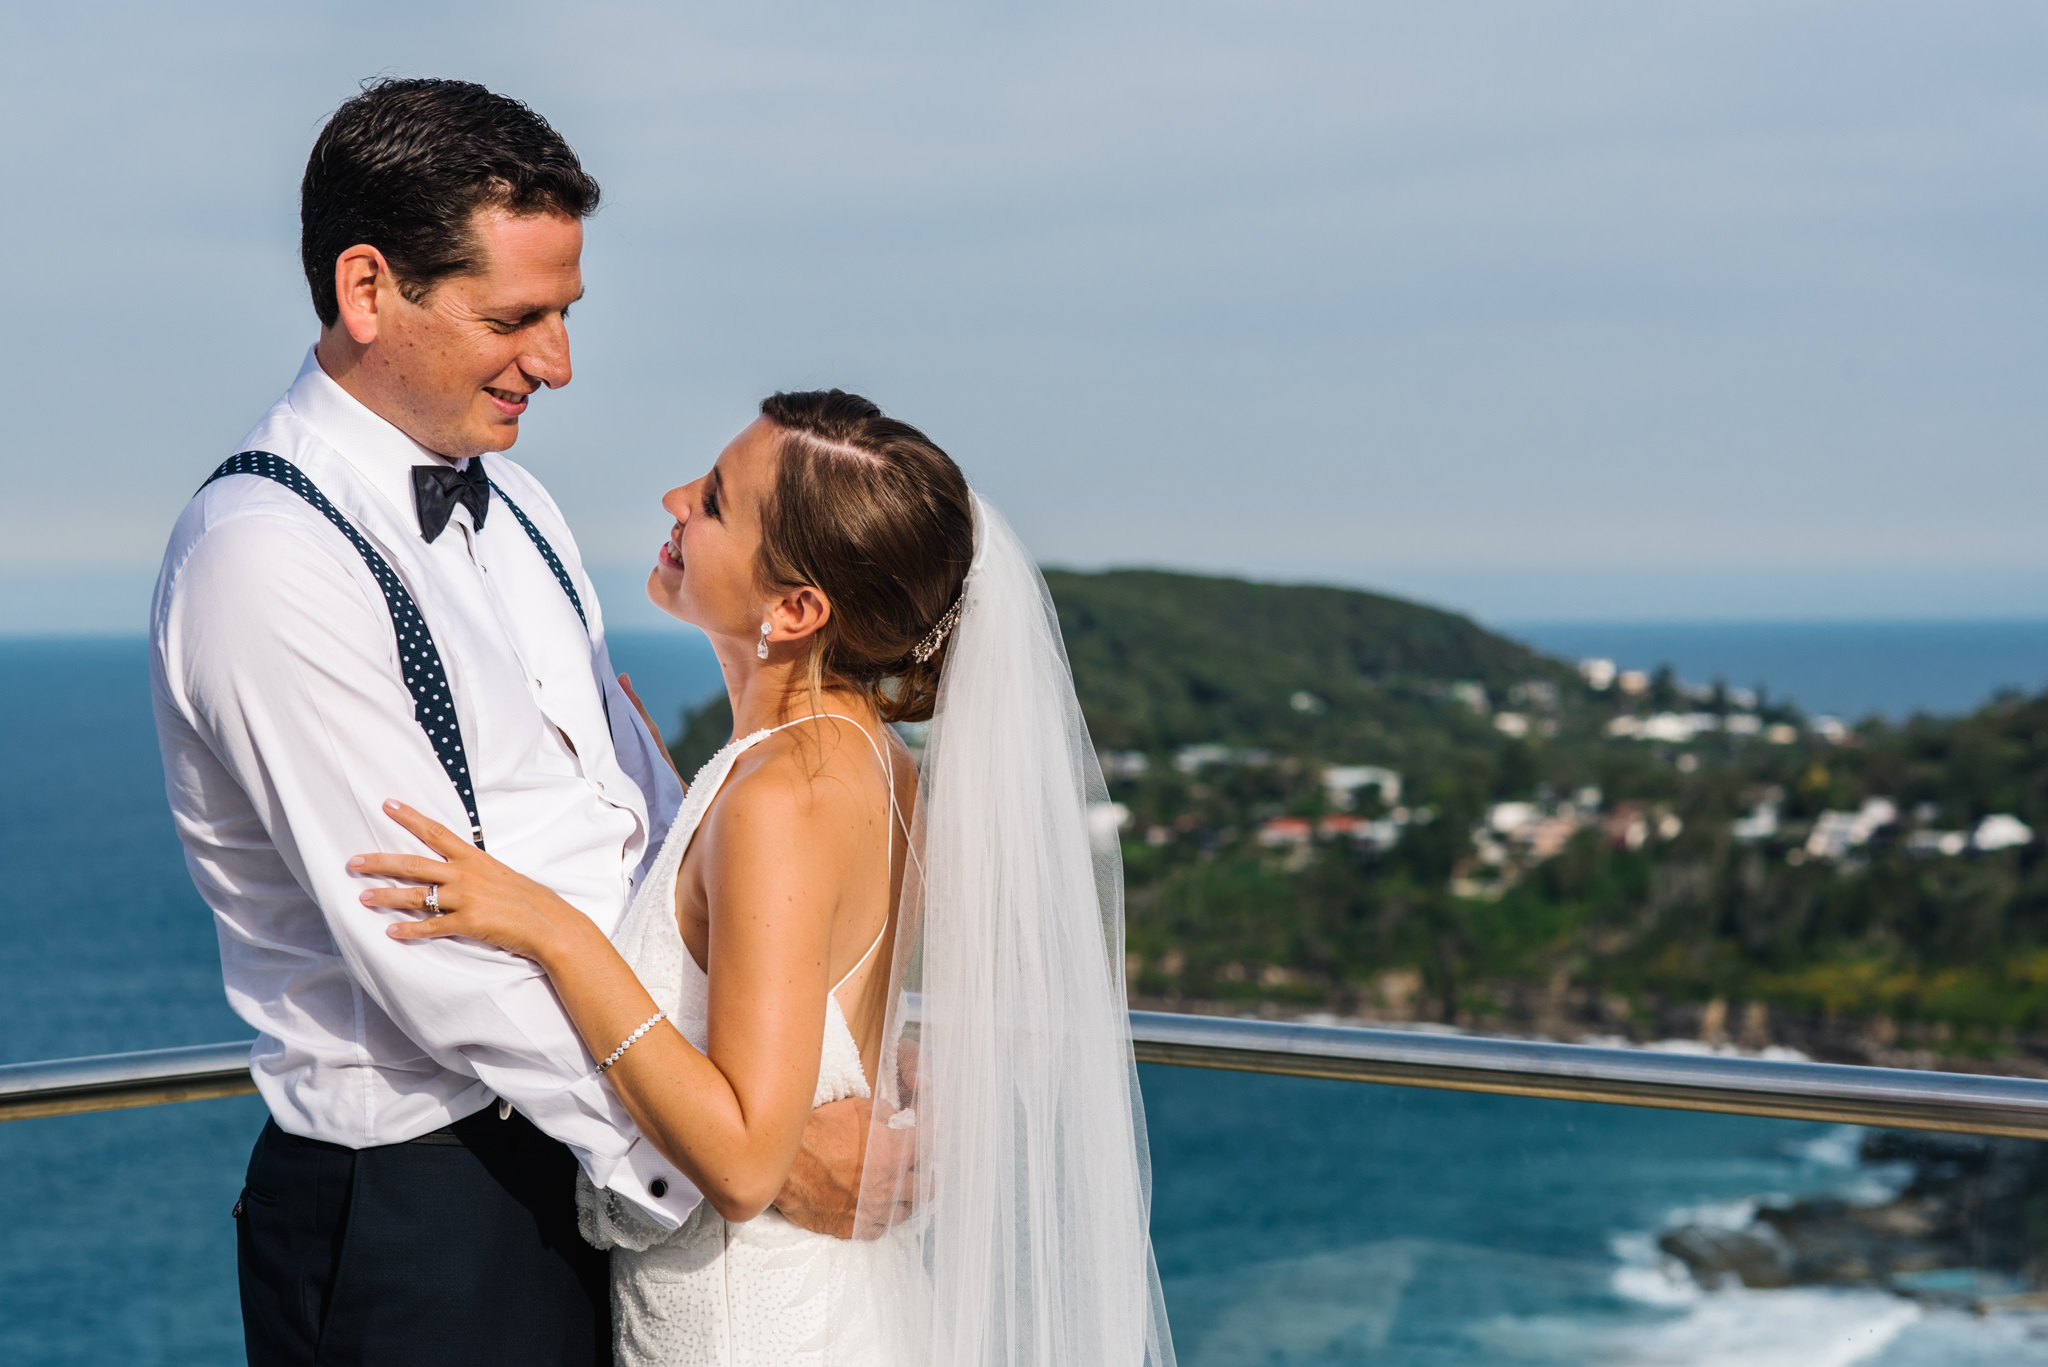 Jonahs-Whale-Beach-wedding-0006.jpg